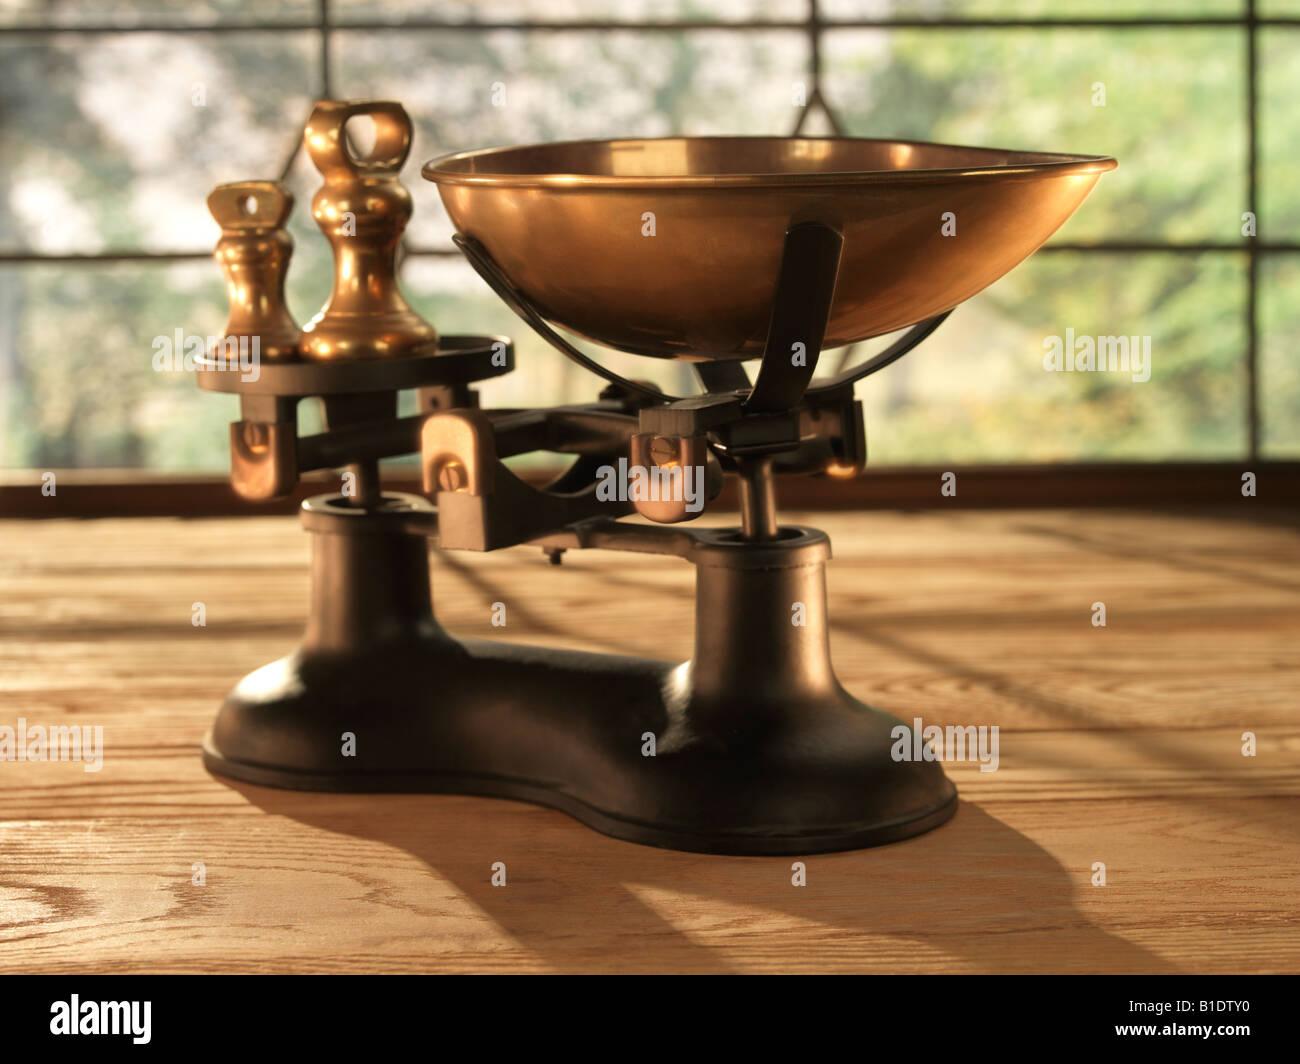 brass scales weighing balanced